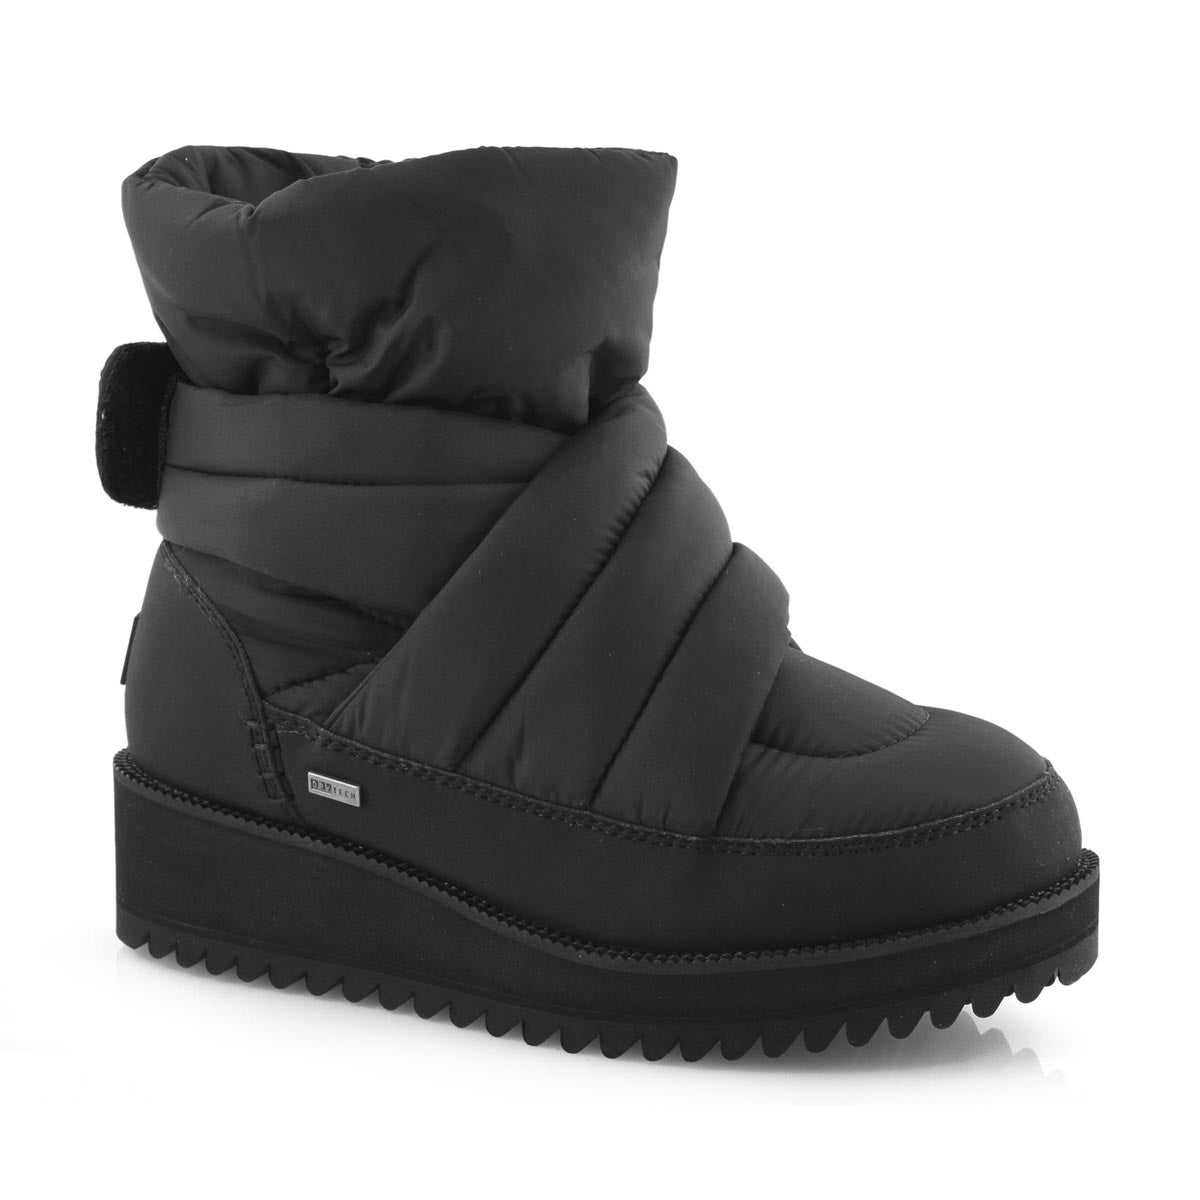 Lds Montara black slip on winter boot